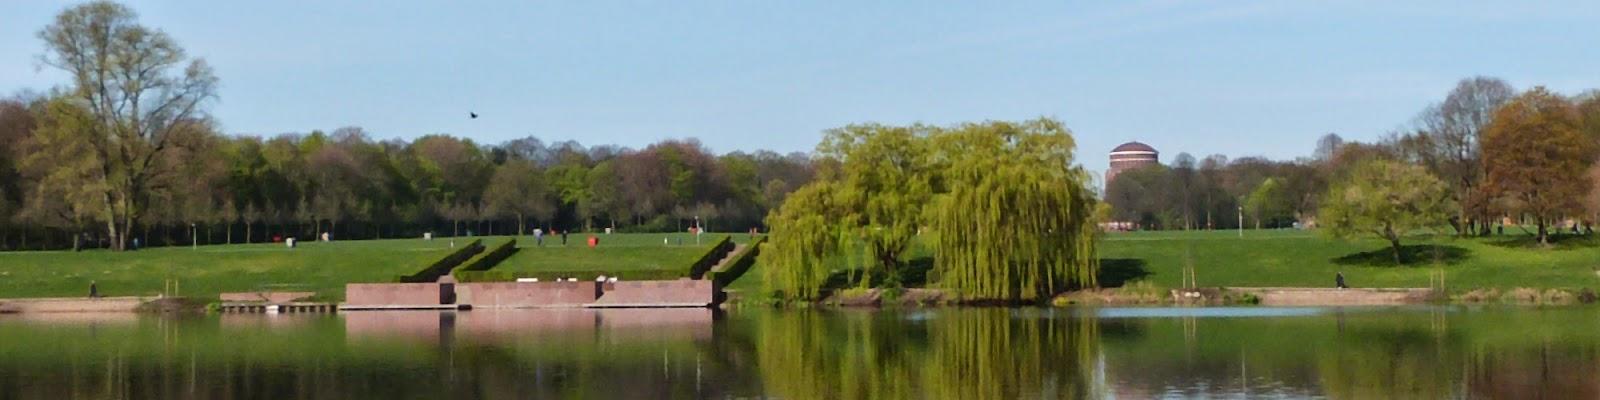 Stadtpark Hamburg